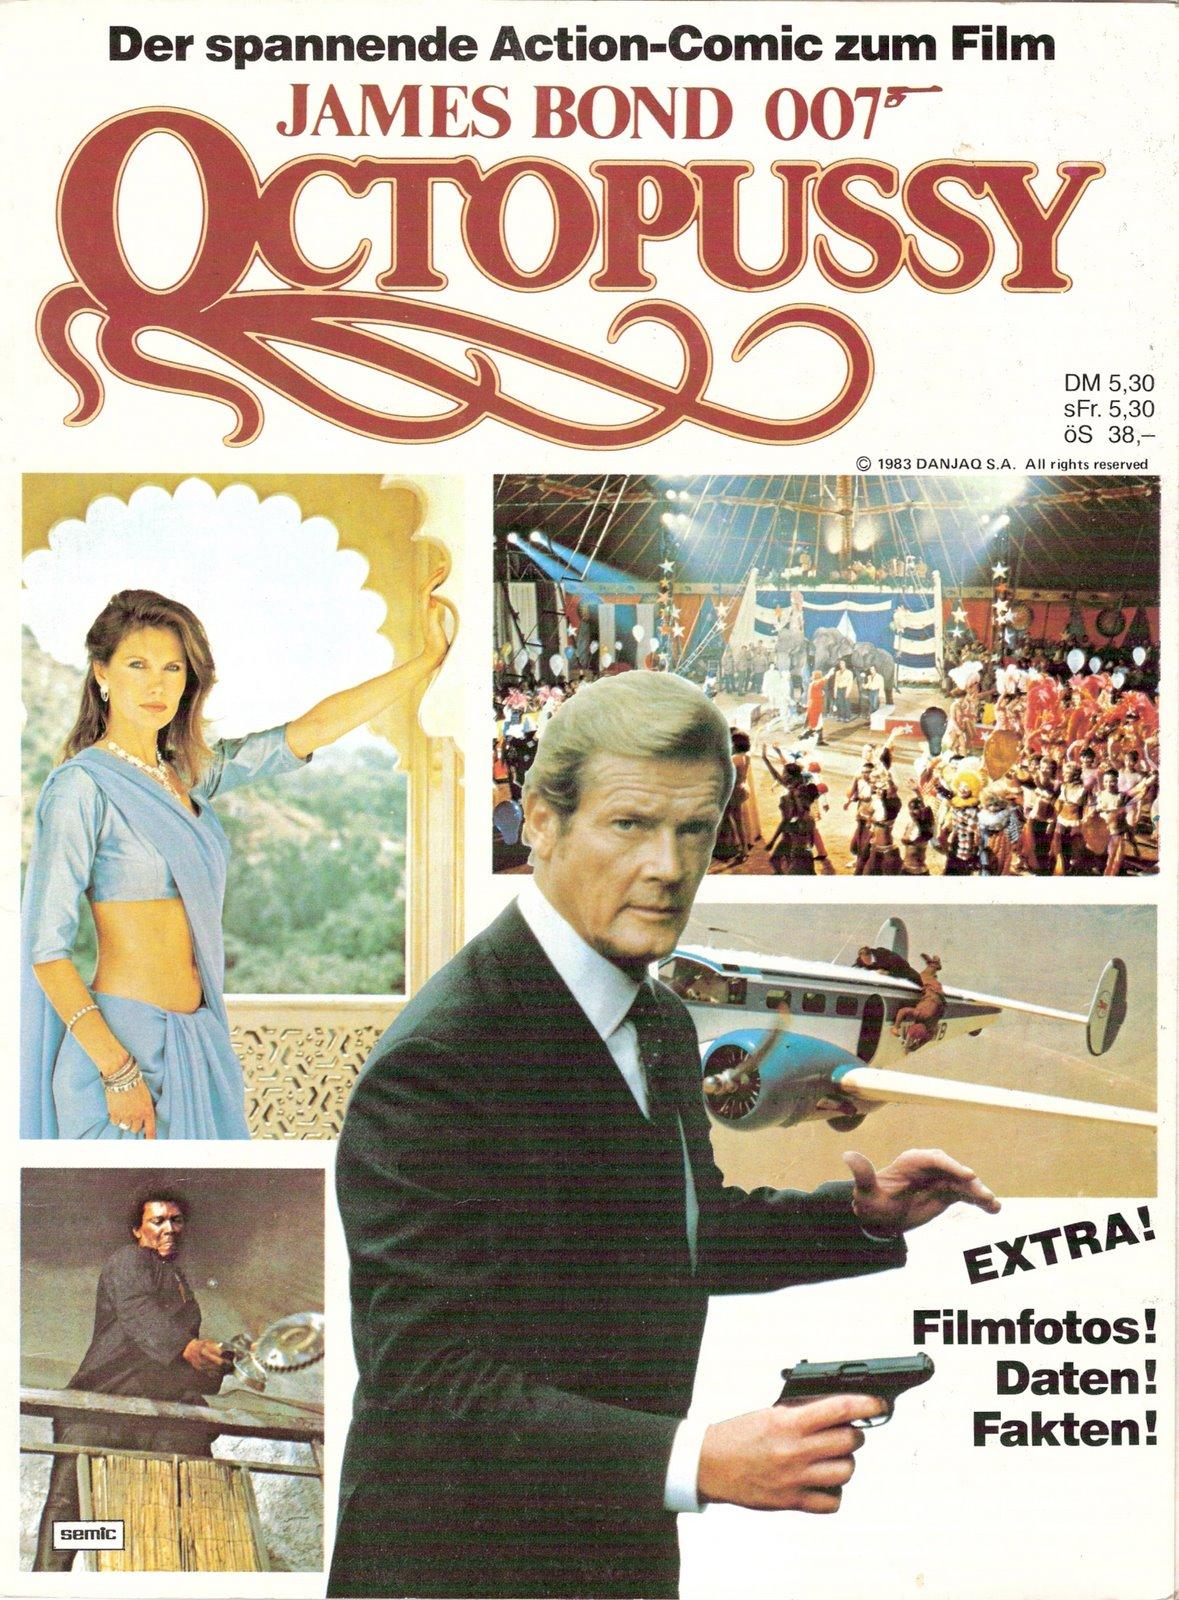 Octopussy (version Semic, 1983)